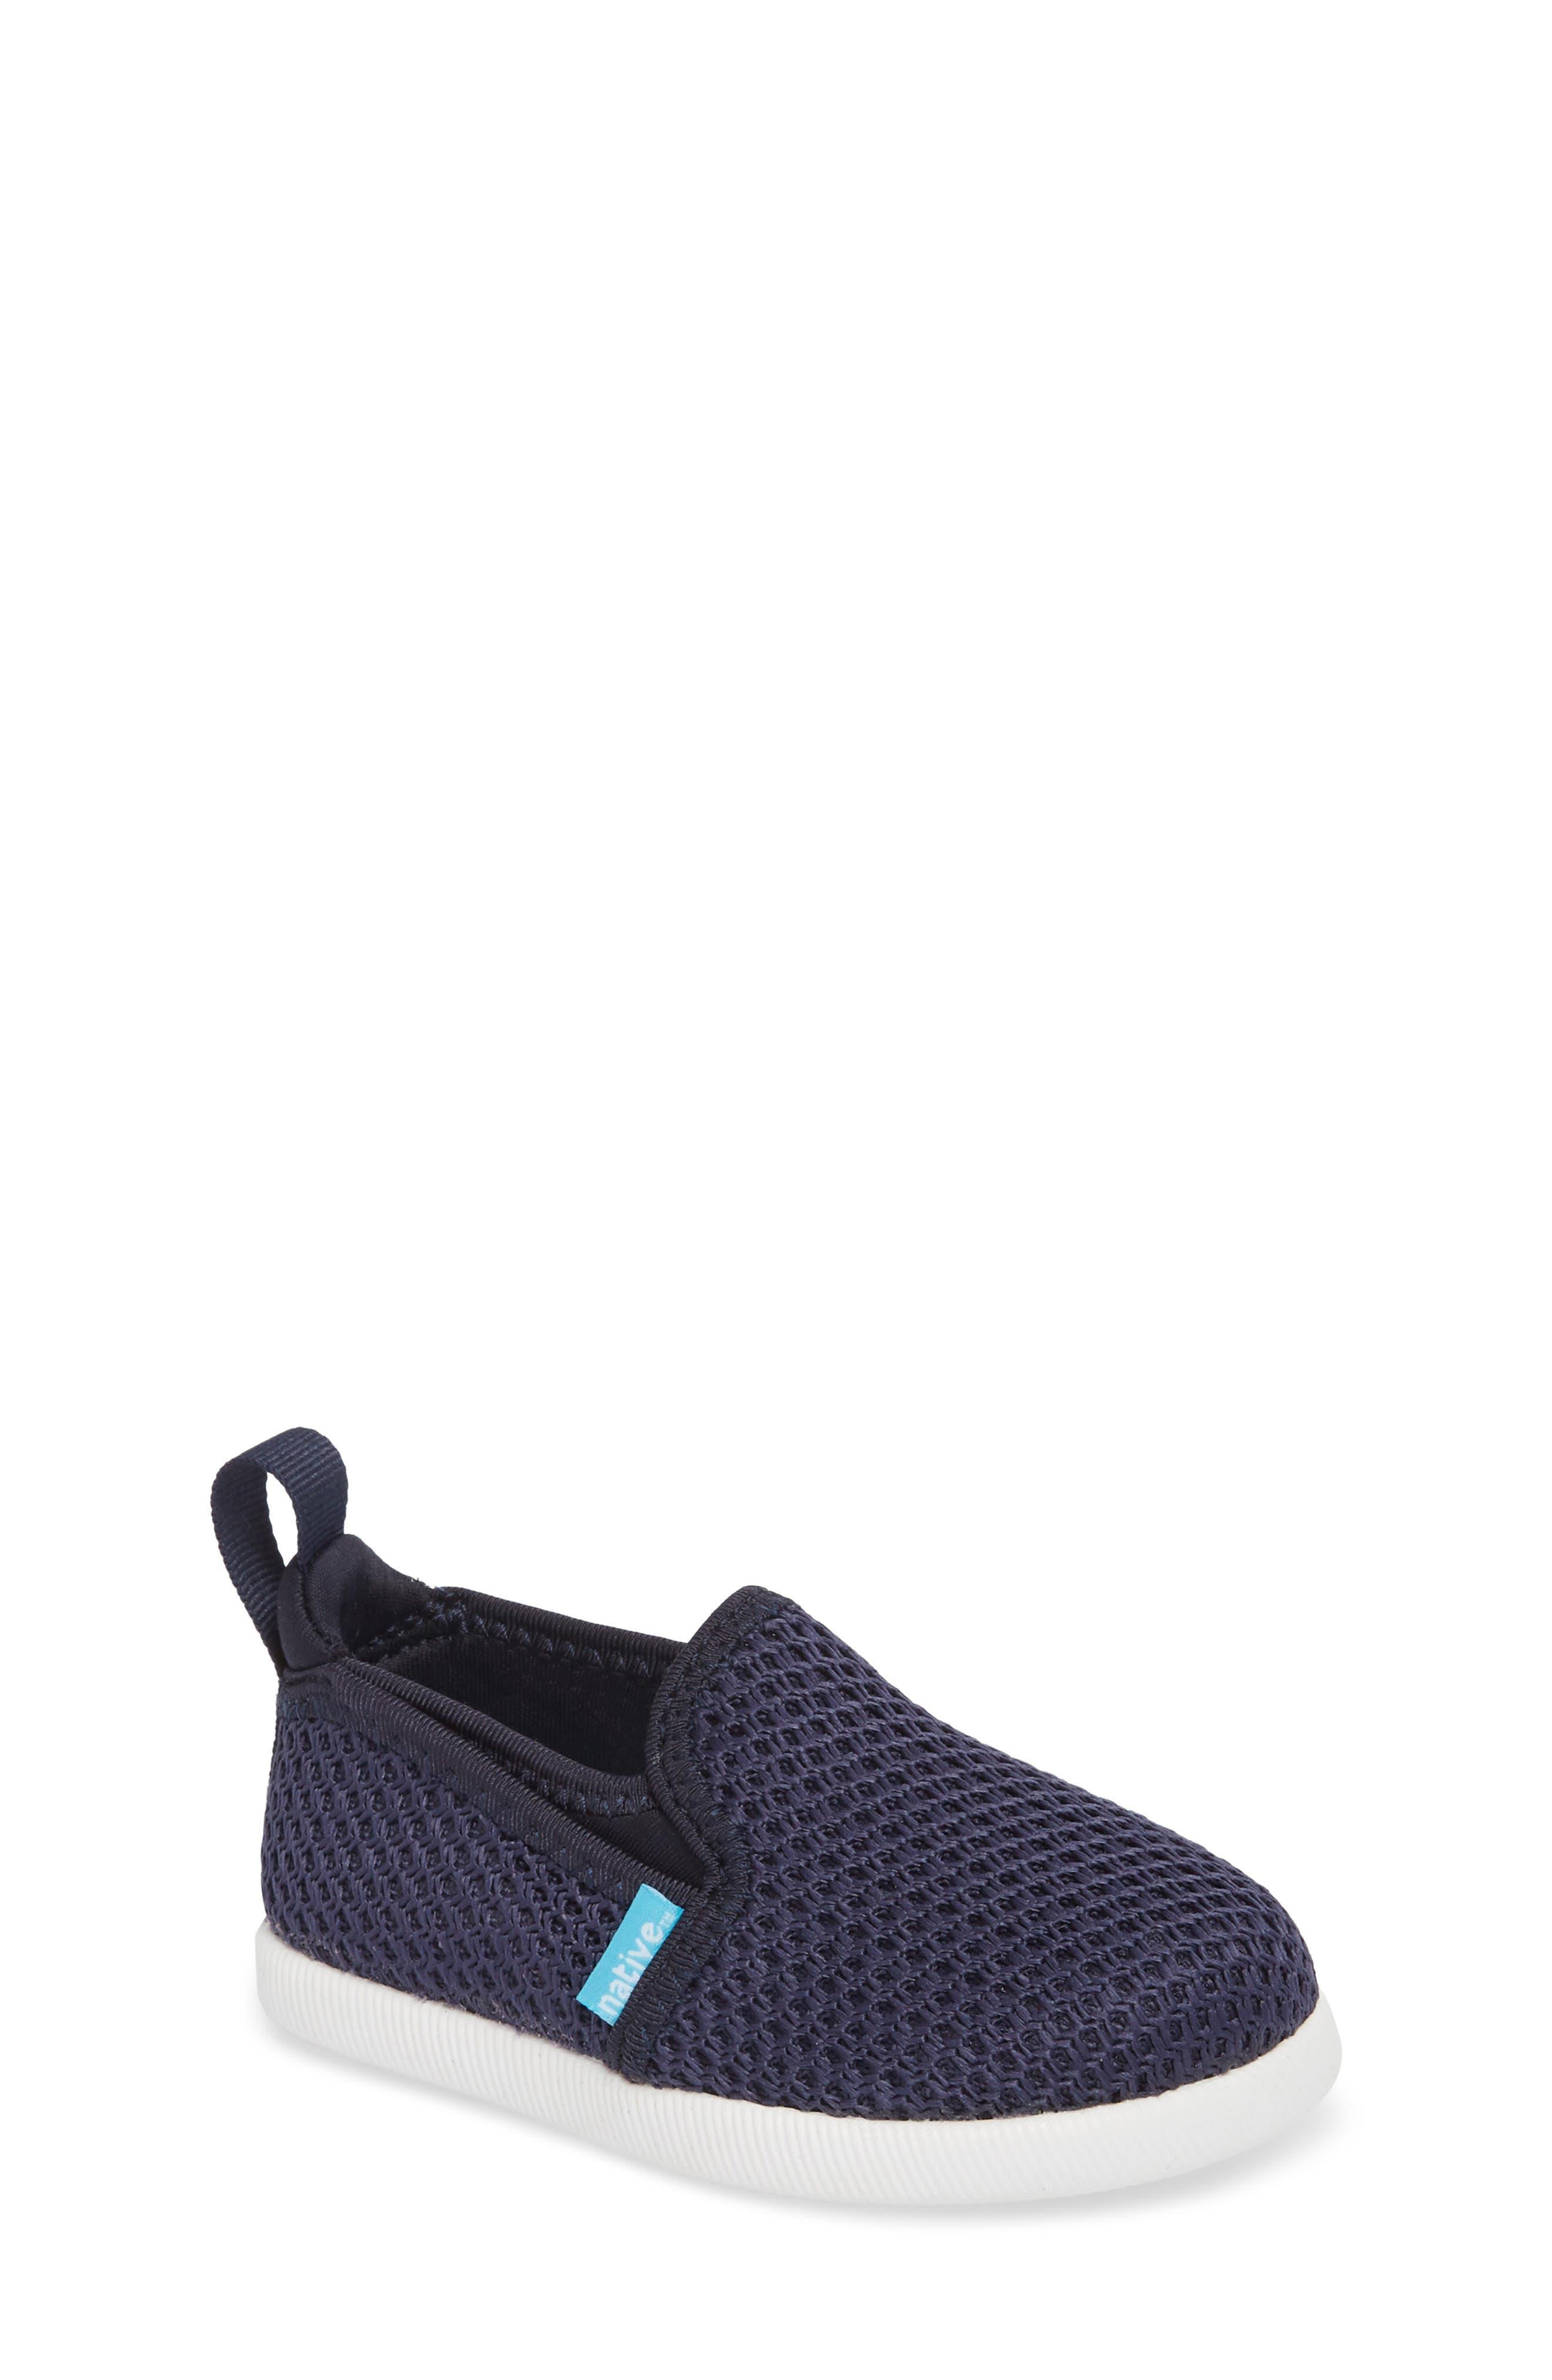 Cruz Woven Slip-On,                         Main,                         color, Regatta Blue/ Shell White